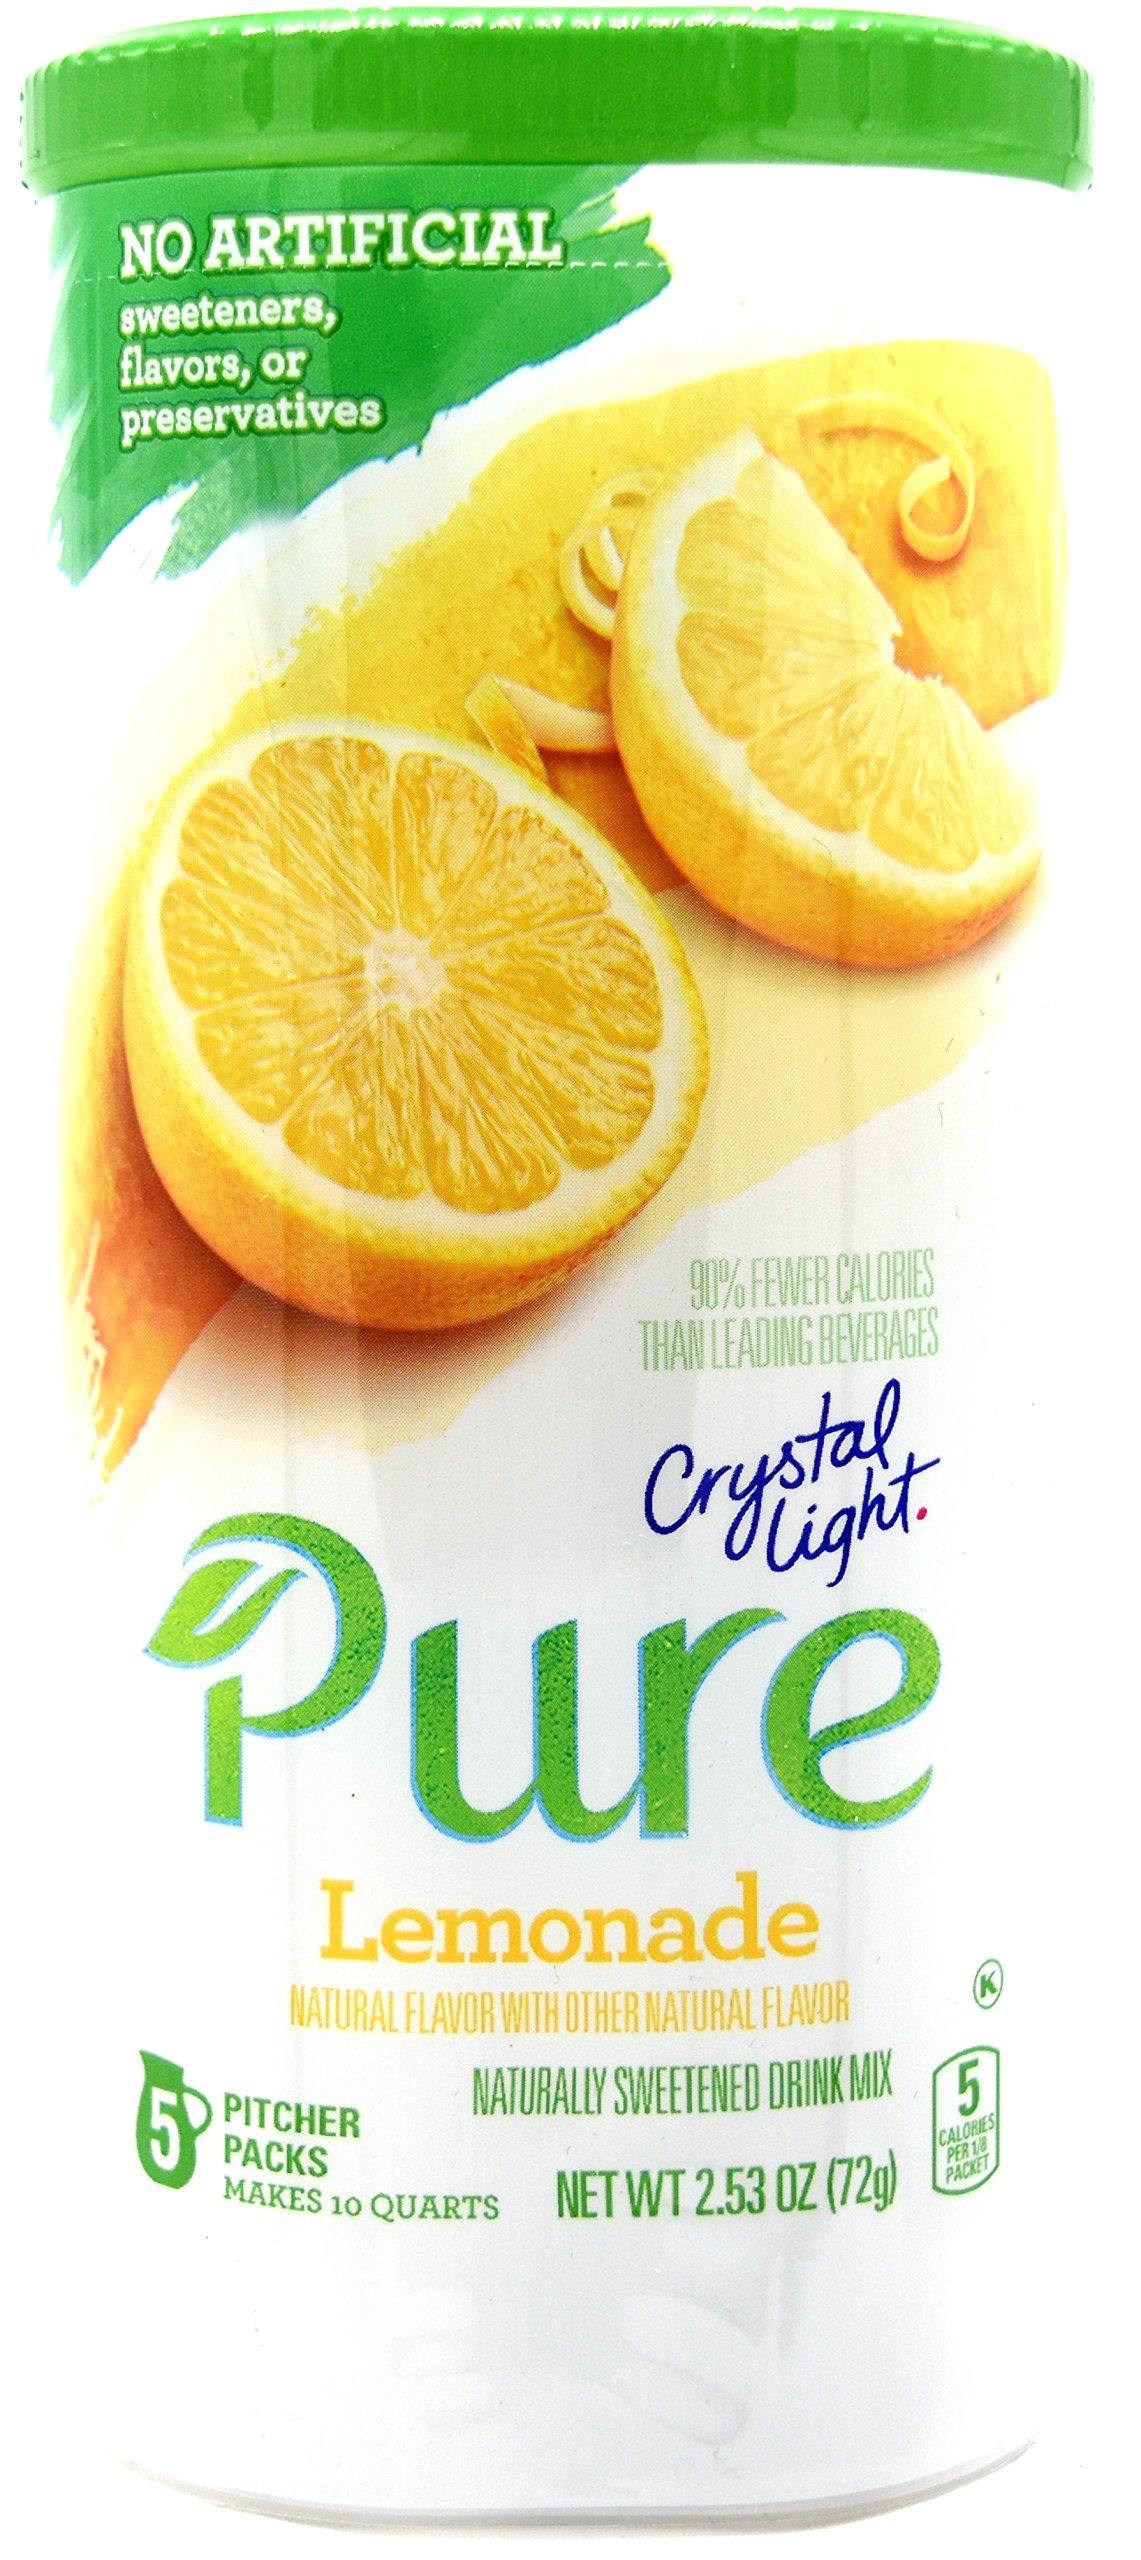 Crystal Light Pure Lemonade Drink Mix, 10-Quart Canister (12 Canister Pack)